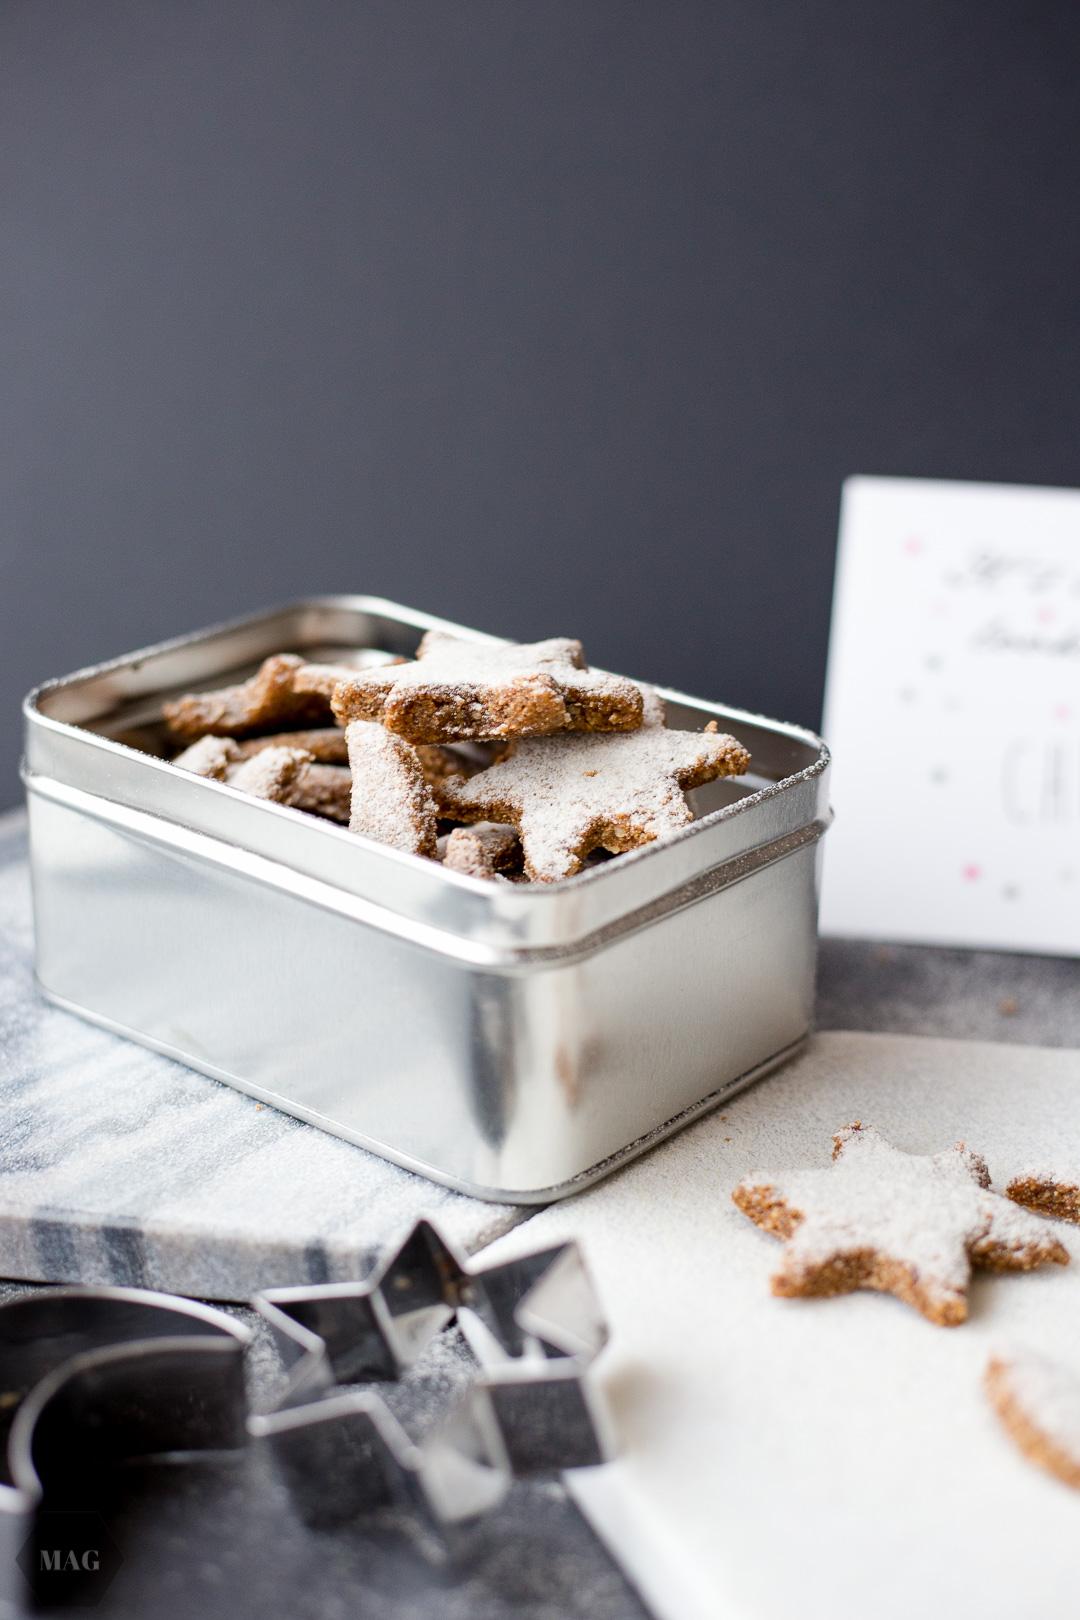 Nuss-Vanille-Kekse, Weihnachtskekse, vegane Kekse, Nusskekse, vegane Kekse mit Mandelmus, Nuss-Sterne, Ausstechplätzchen vegan